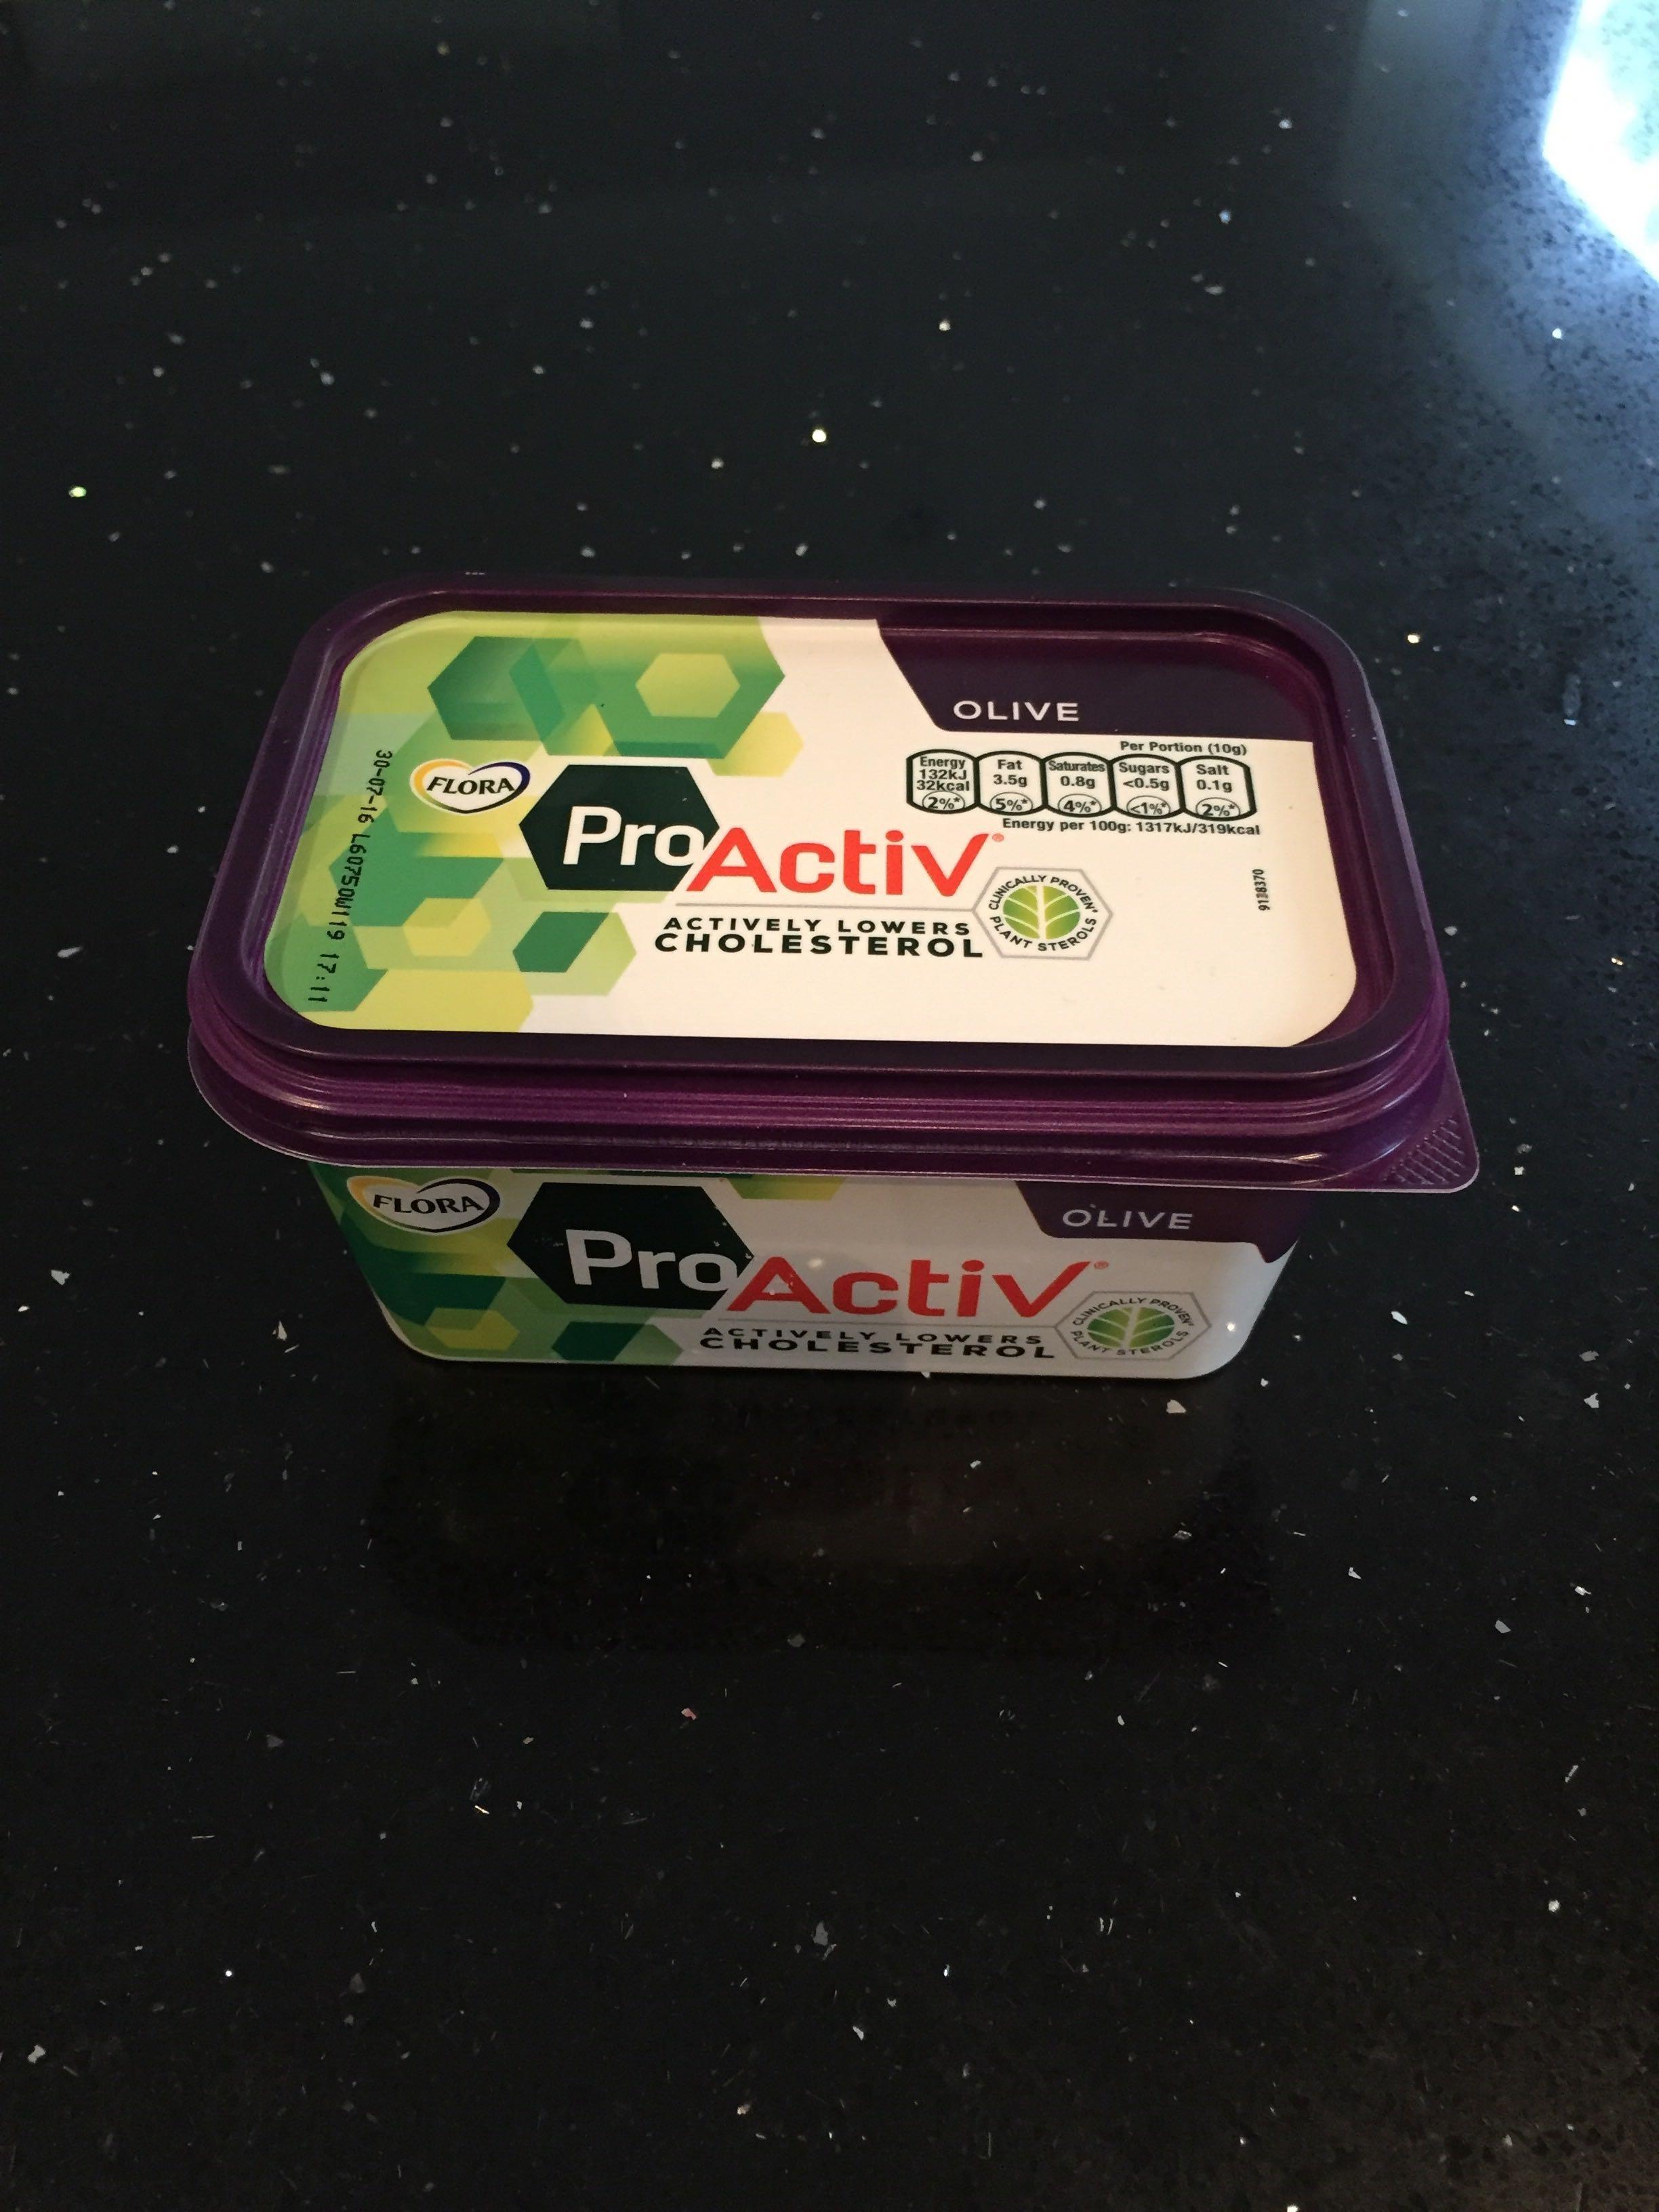 ProActiv Olive Oil Spread - Produit - en